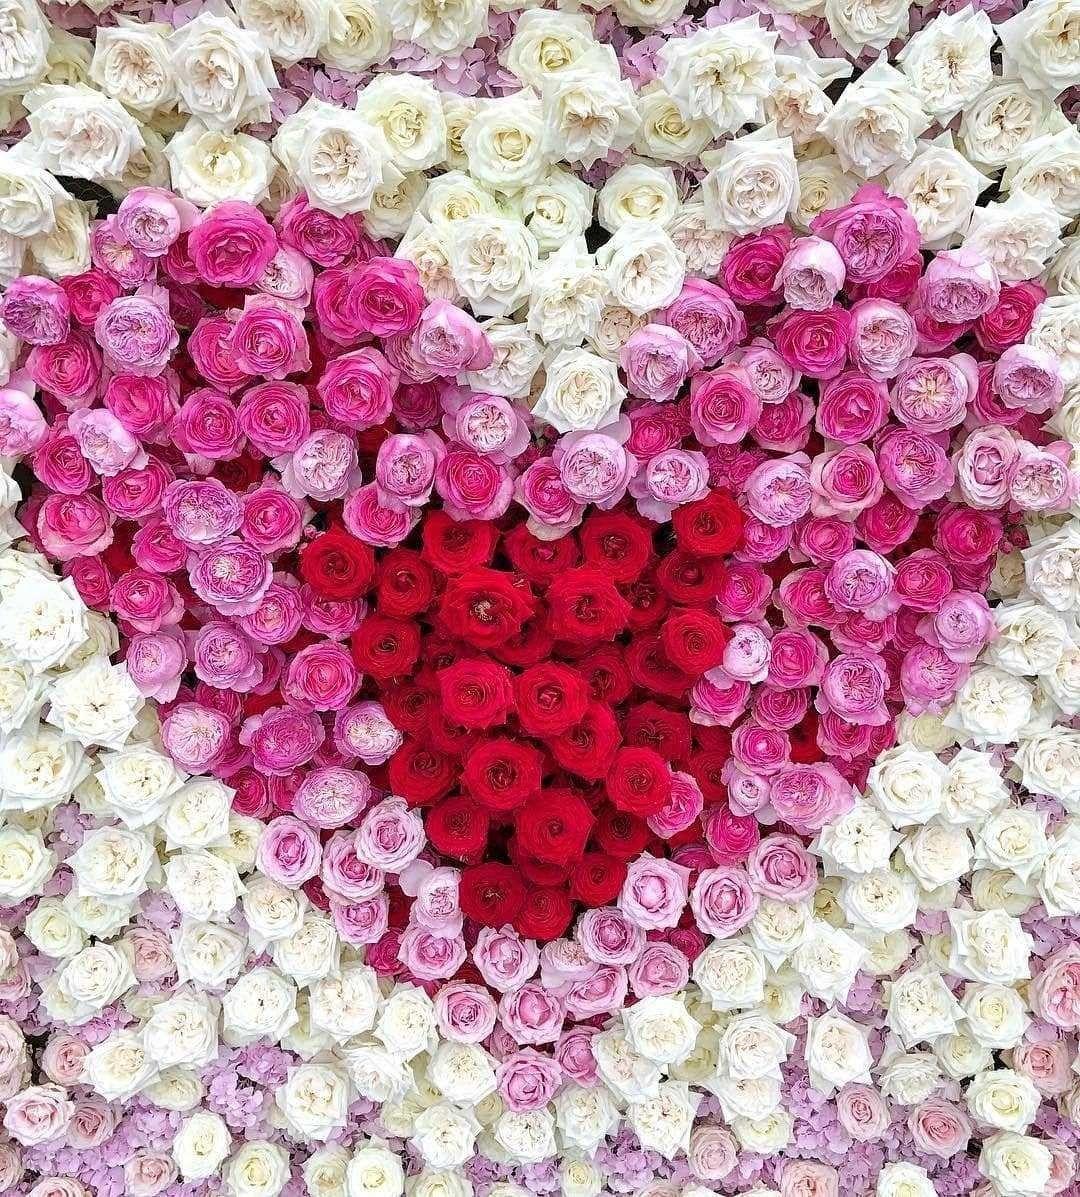 Valentines love rose floral wall heart design roses pinterest valentines love rose floral wall heart design izmirmasajfo